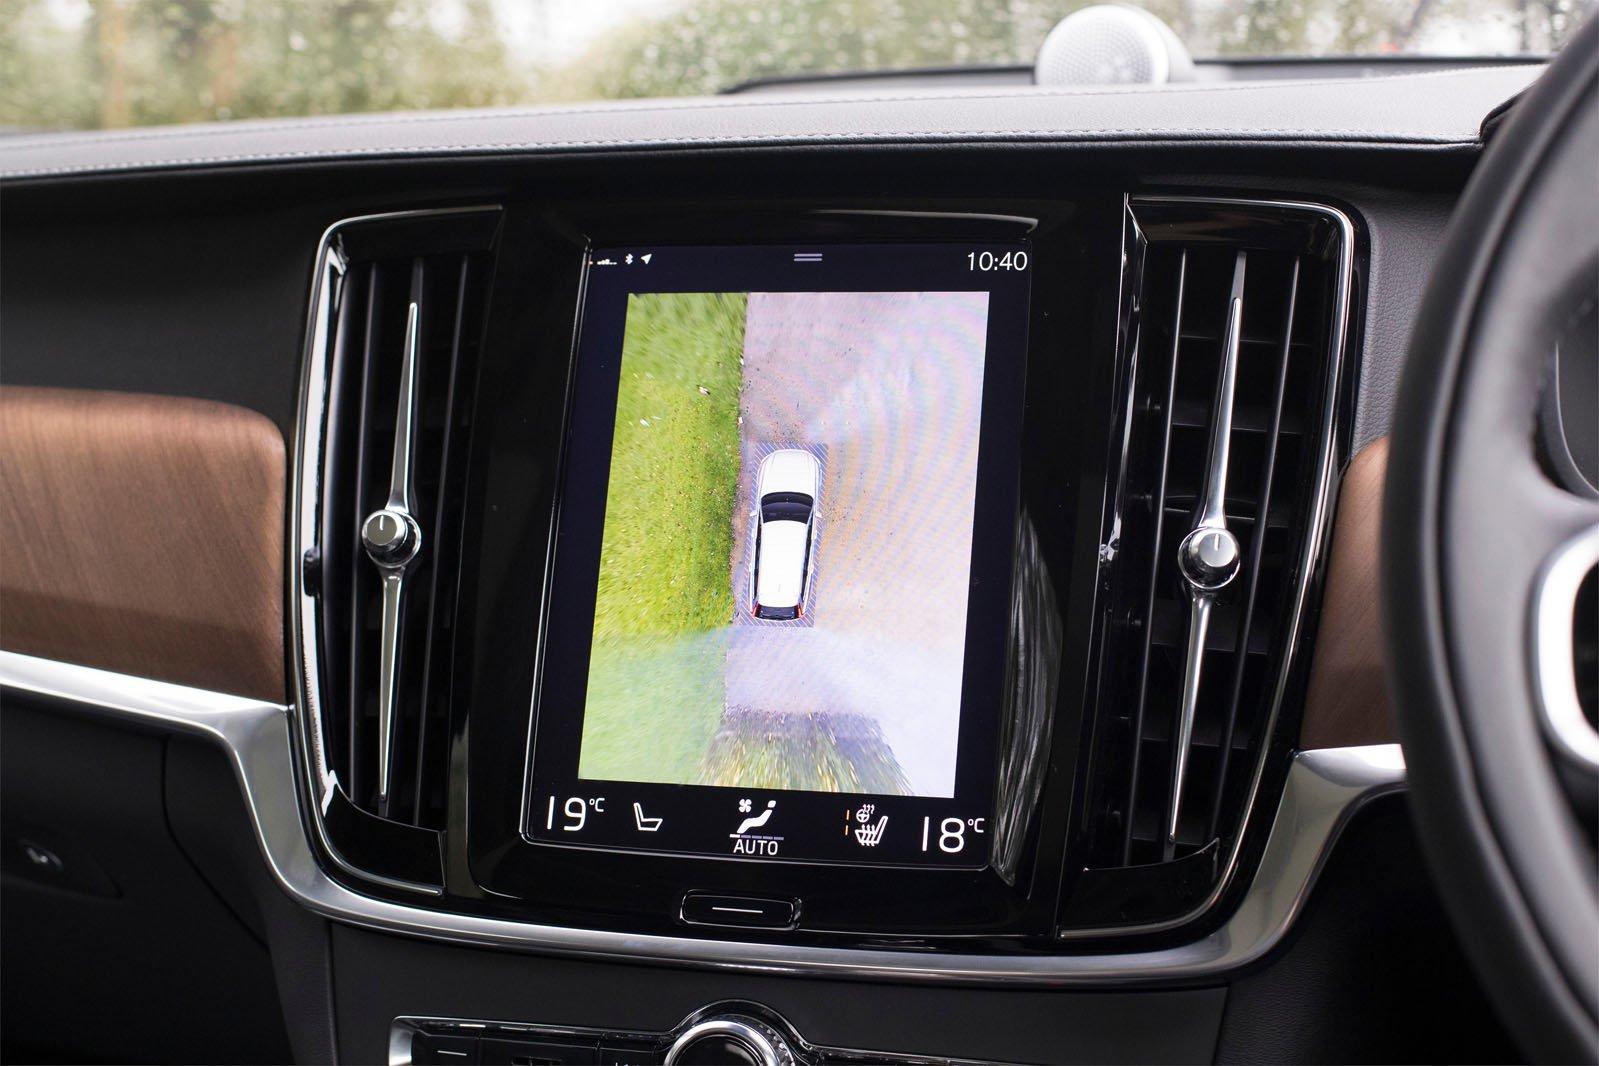 Volvo V90 2018 RHD infotainment